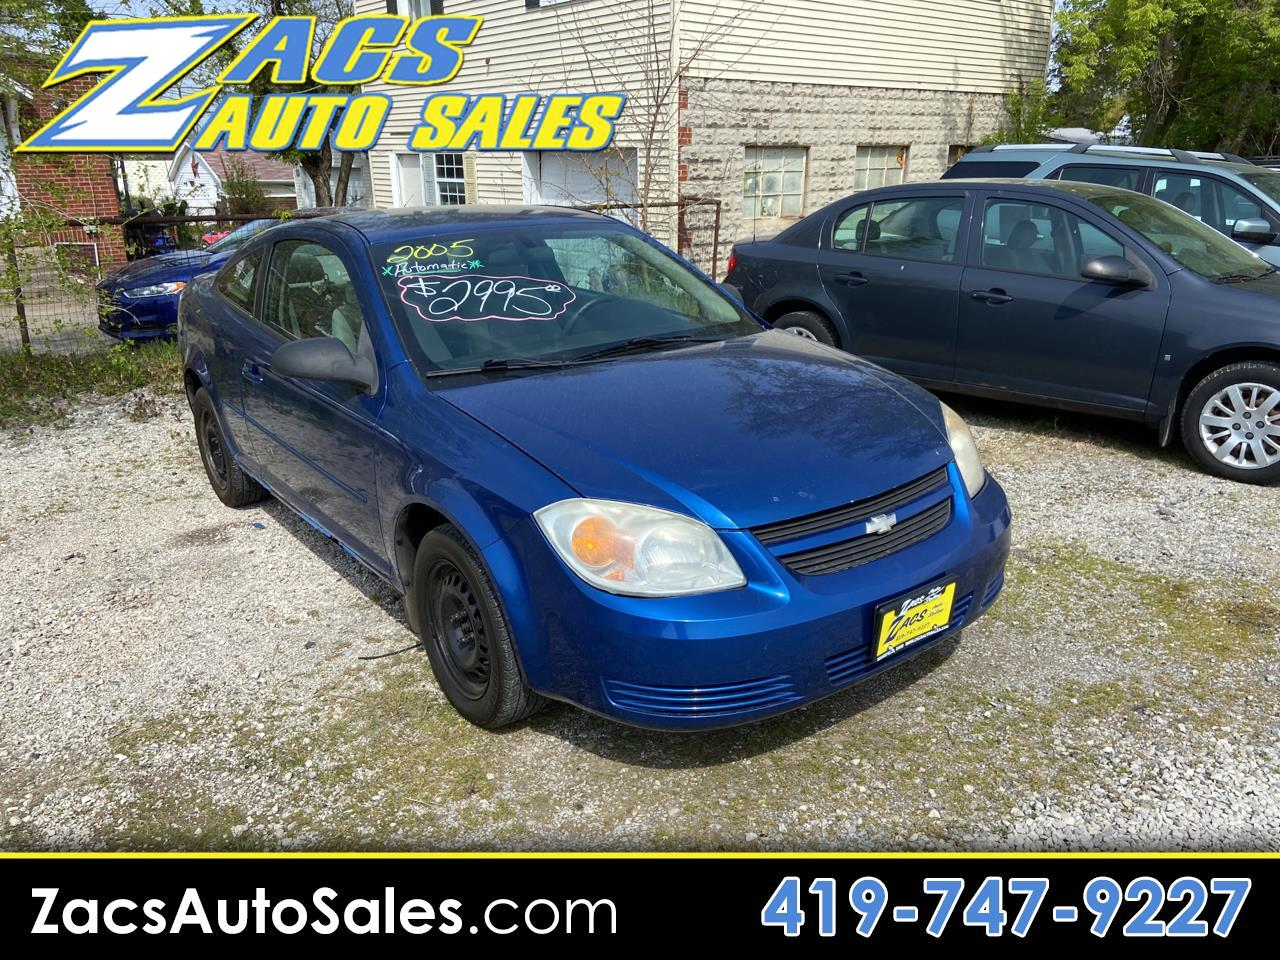 Chevrolet Cobalt Coupe 2005